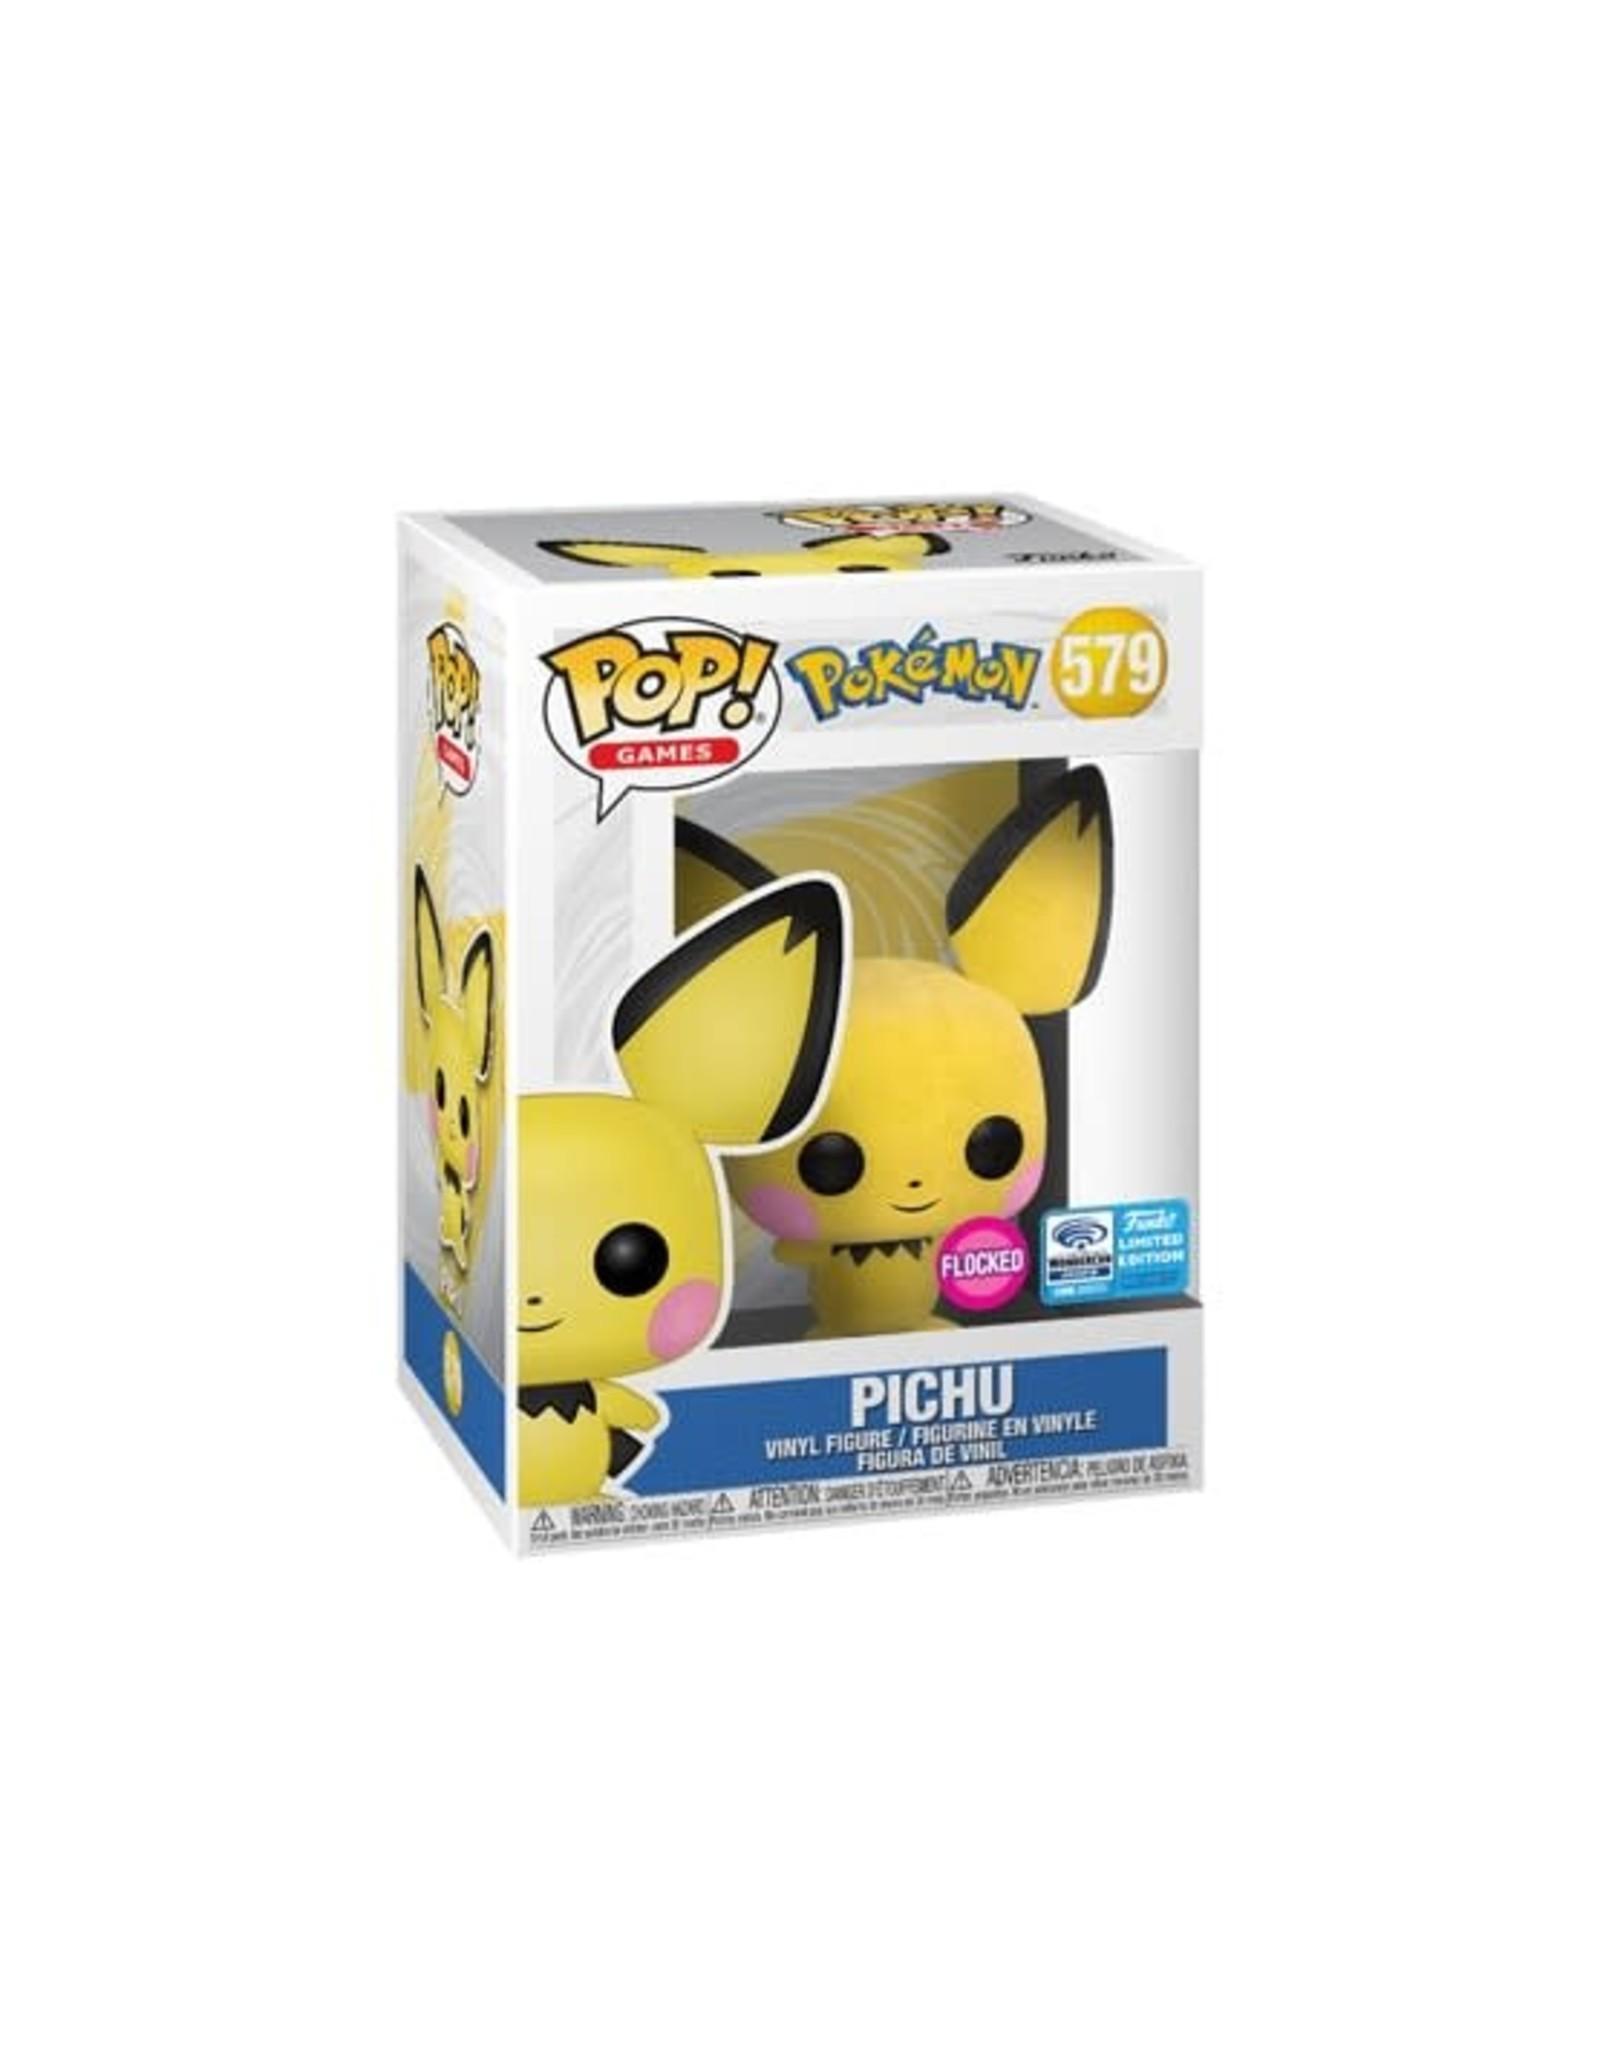 Pokémon - Funko Pop! Games 579 - Pichu Flocked - 2020 Limited Edition